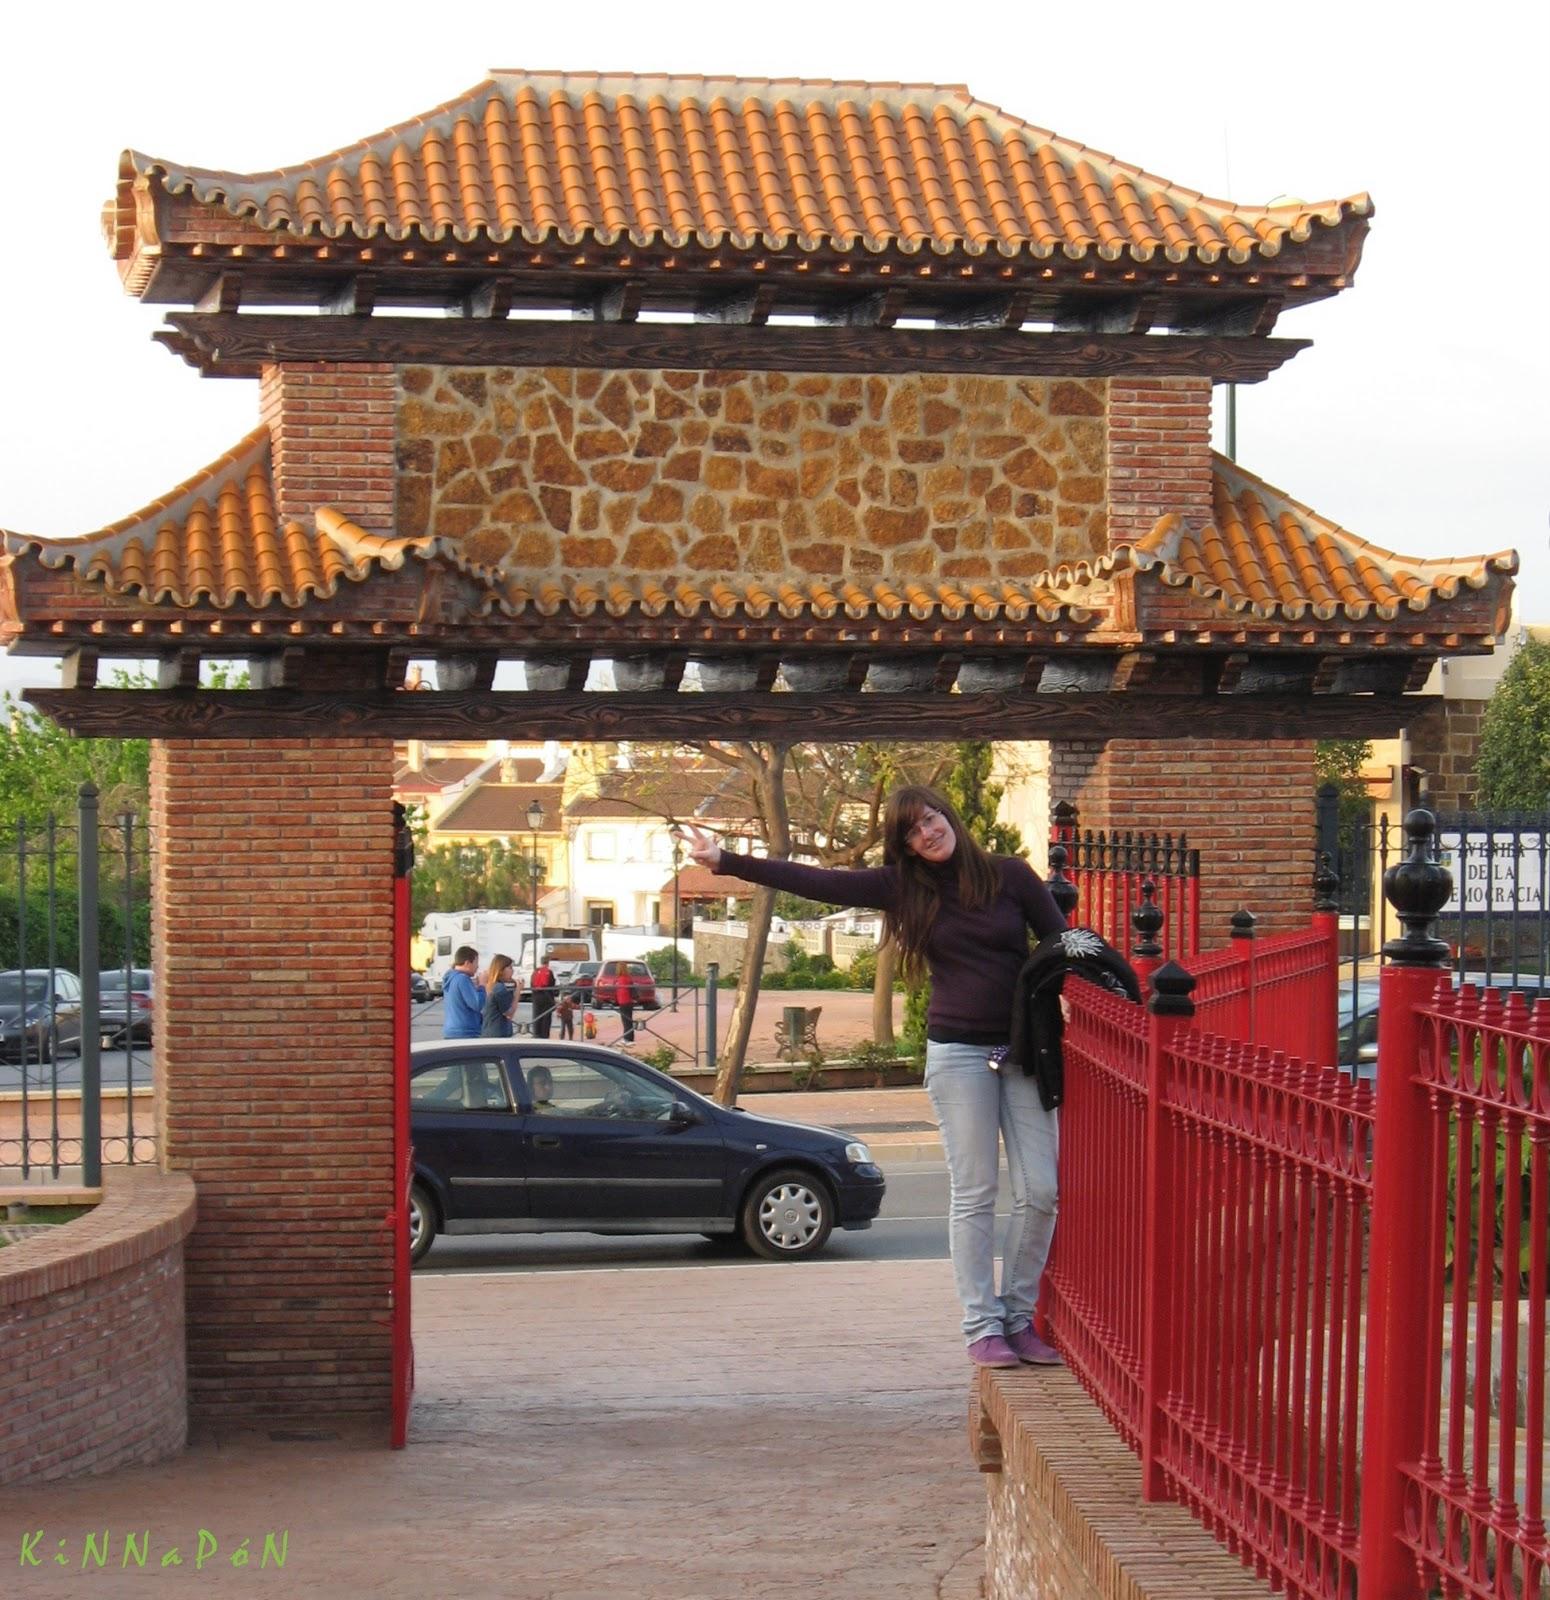 Kinnap n parque oriental alhaurin de la torre for Jardin oriental bienquerido alhaurin de la torre